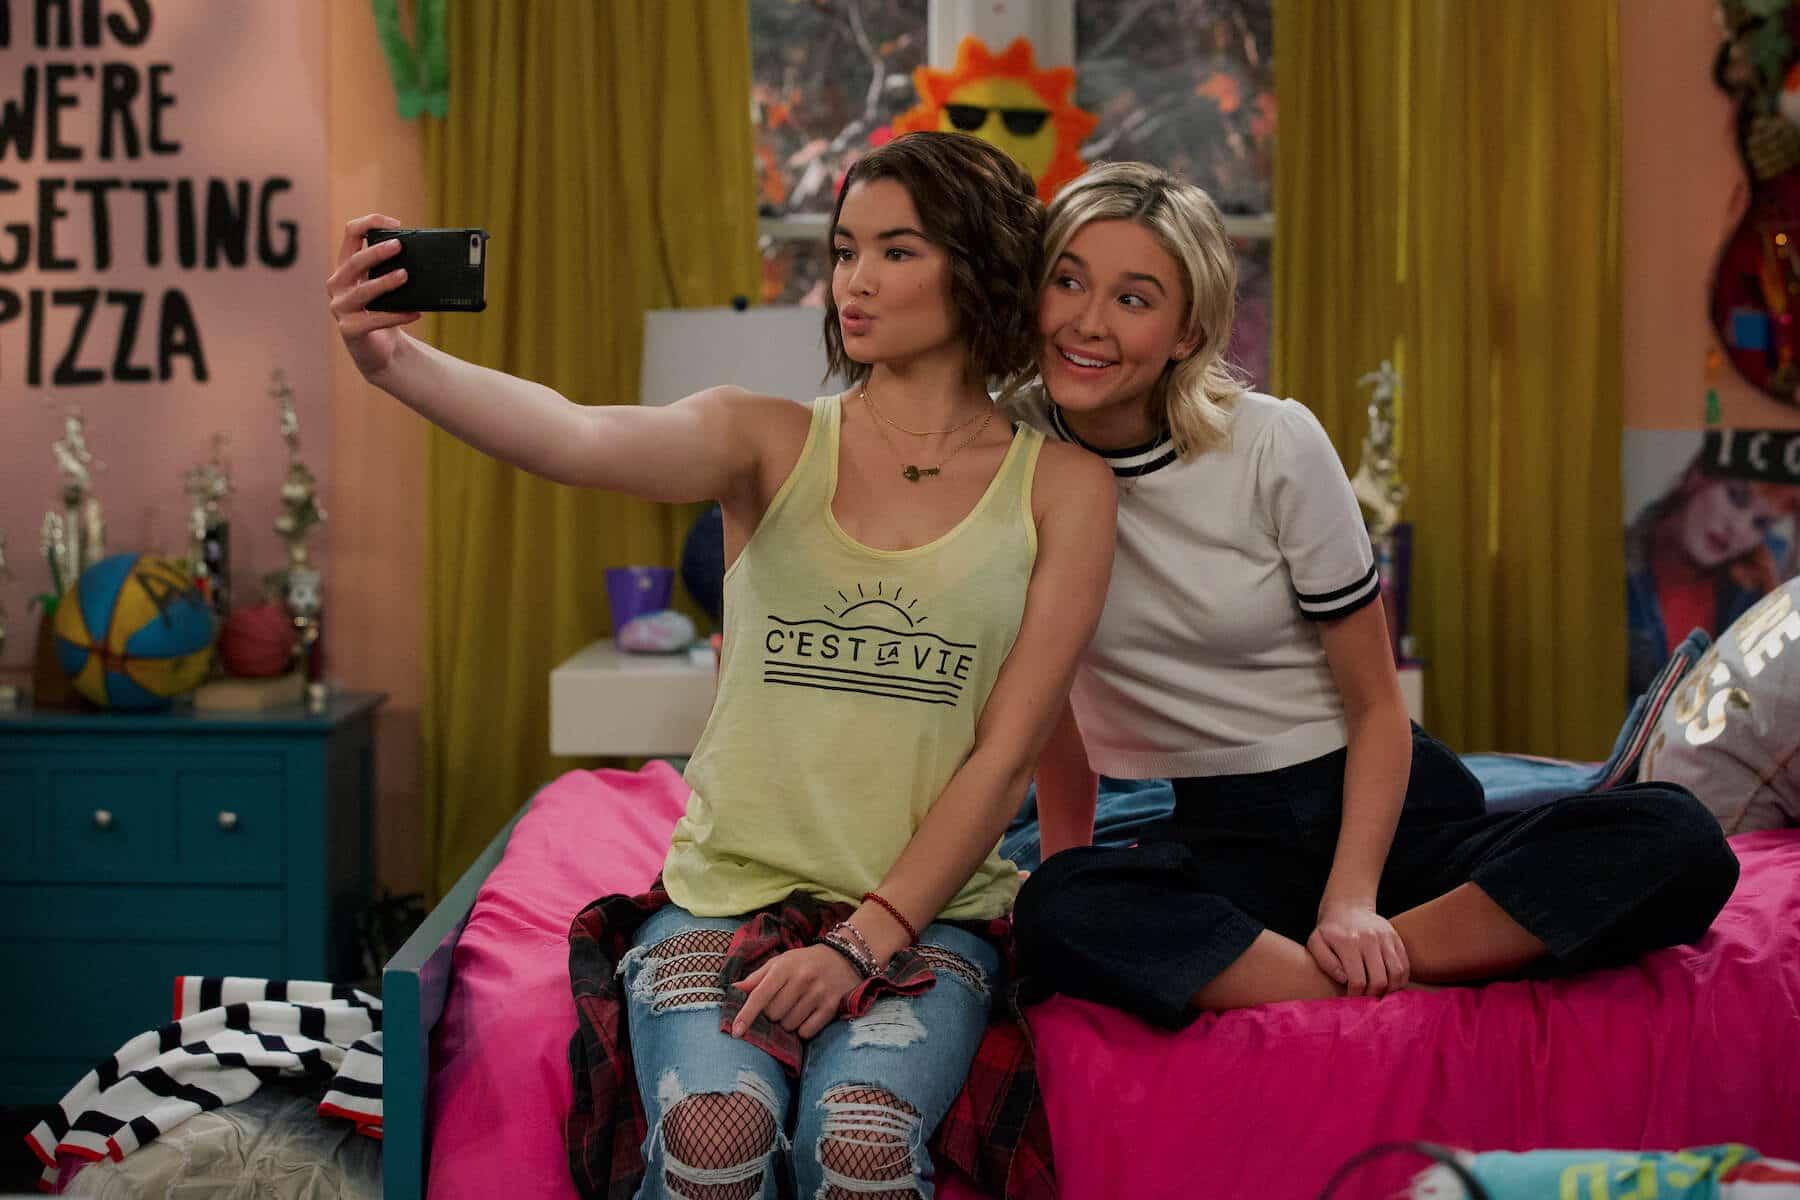 Alexa and Katie sesong 2. Foto: Netflix